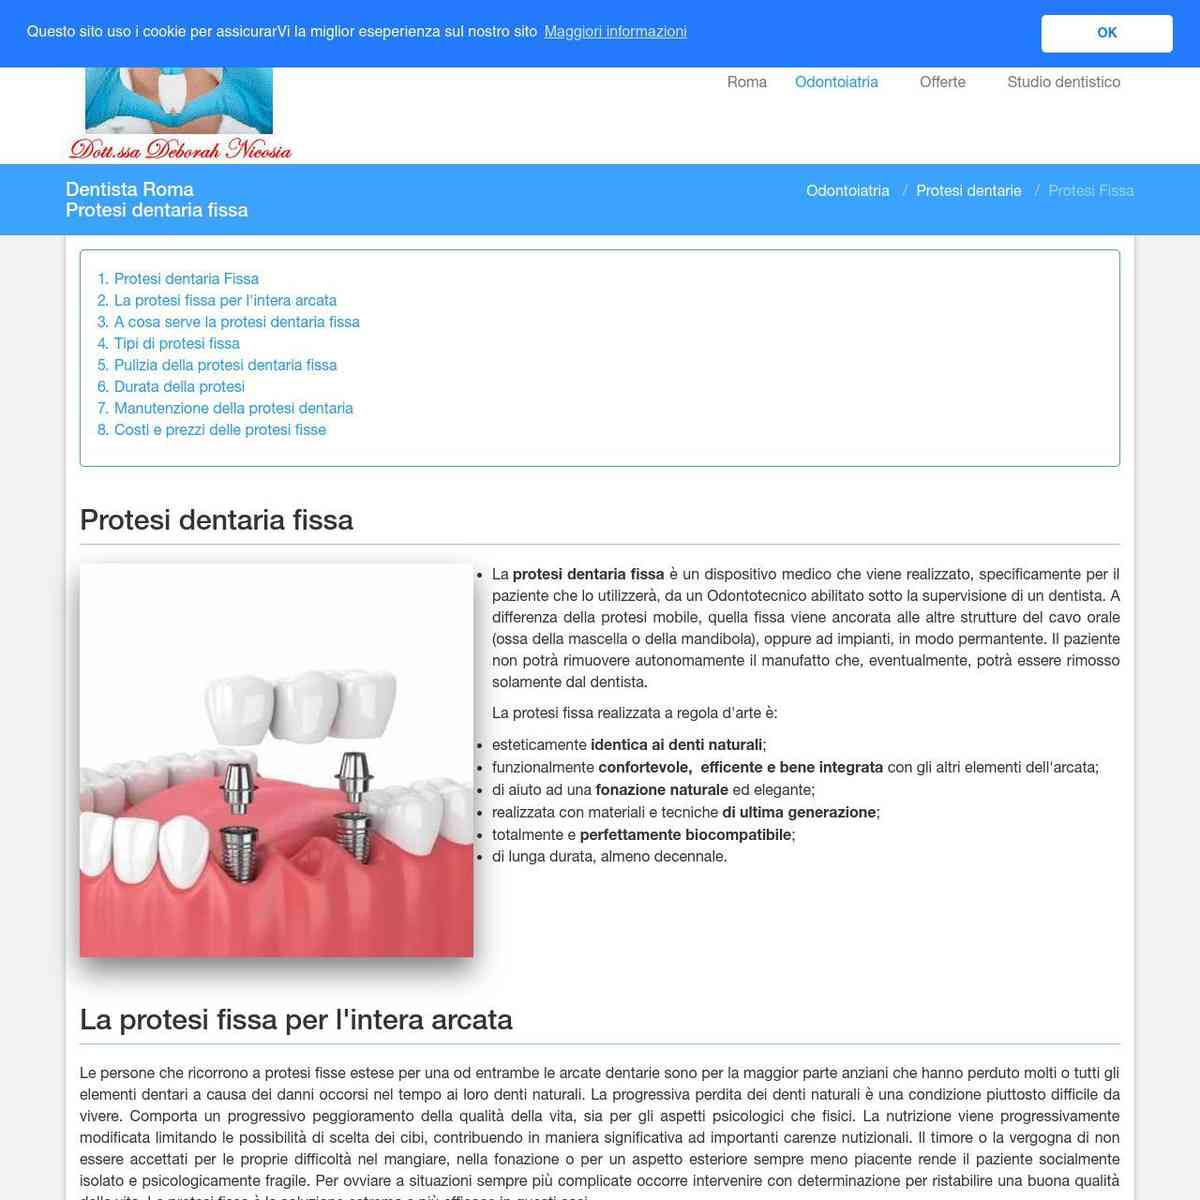 Protesi dentaria fissa - Dentista Roma